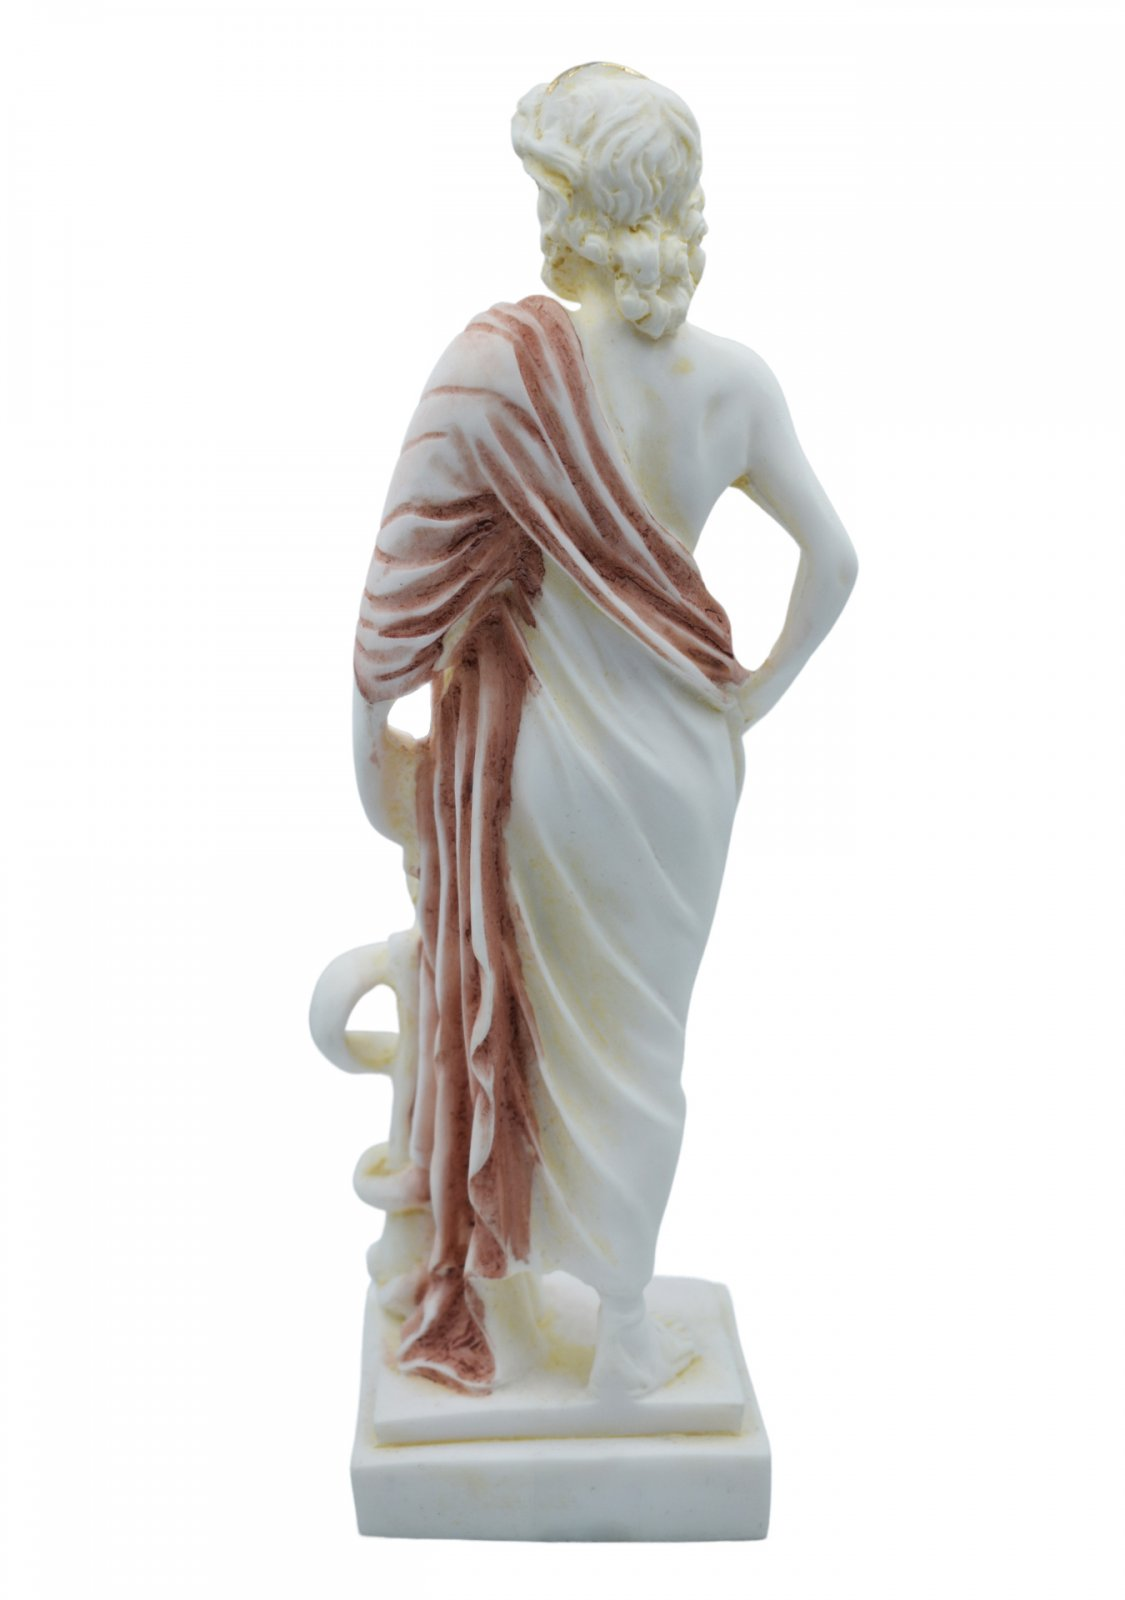 Ascelpius (Asklepios), the greek god of medicine, alabaster statue with color and patina